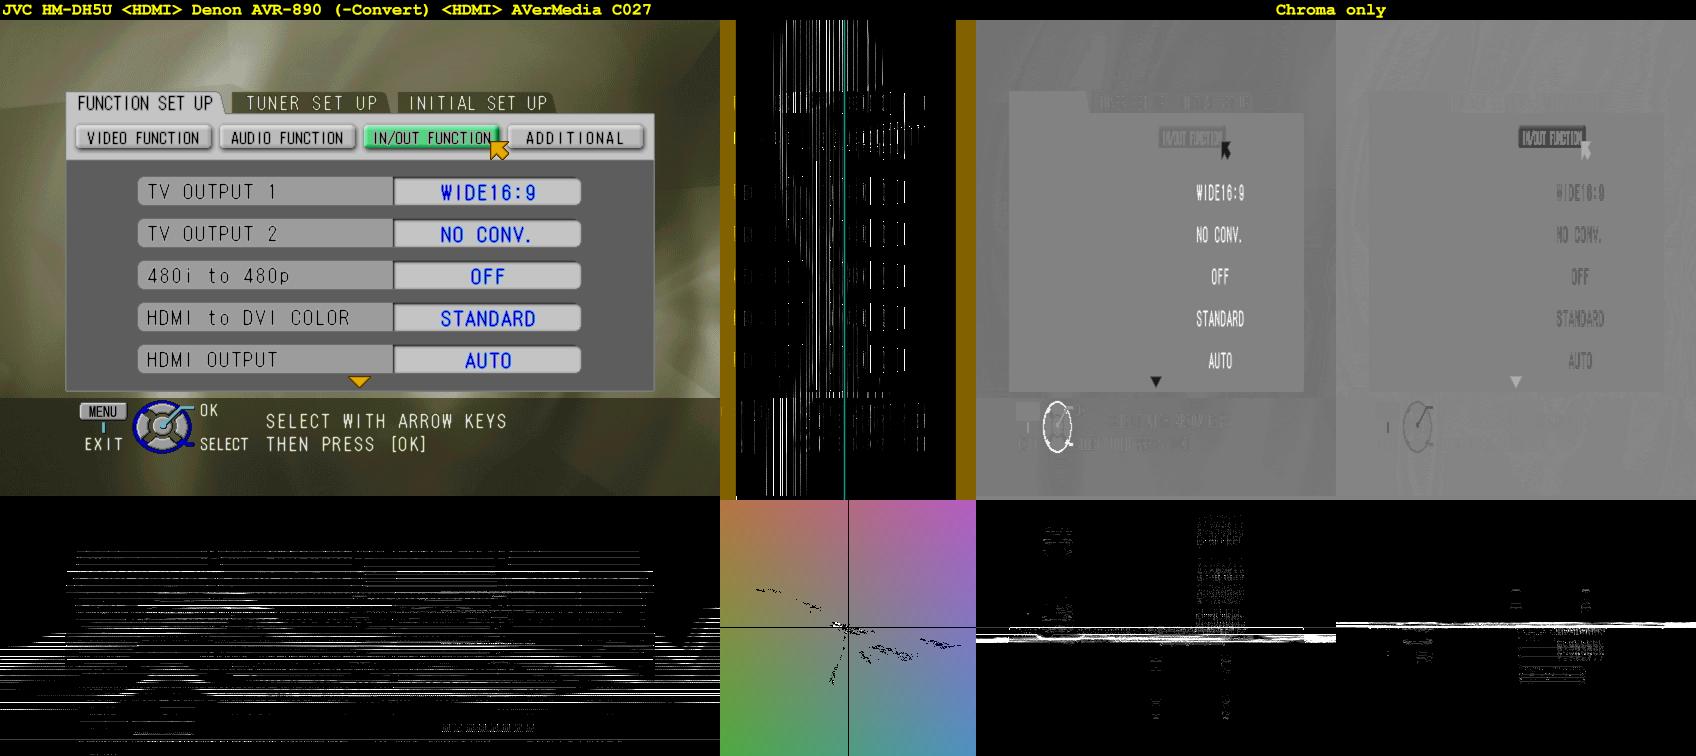 Click image for larger version  Name:Menu - JVC HM-DH5U =HDMI= Denon AVR-890, -Convert =HDMI= AVerMedia C027.png Views:3681 Size:395.6 KB ID:35275